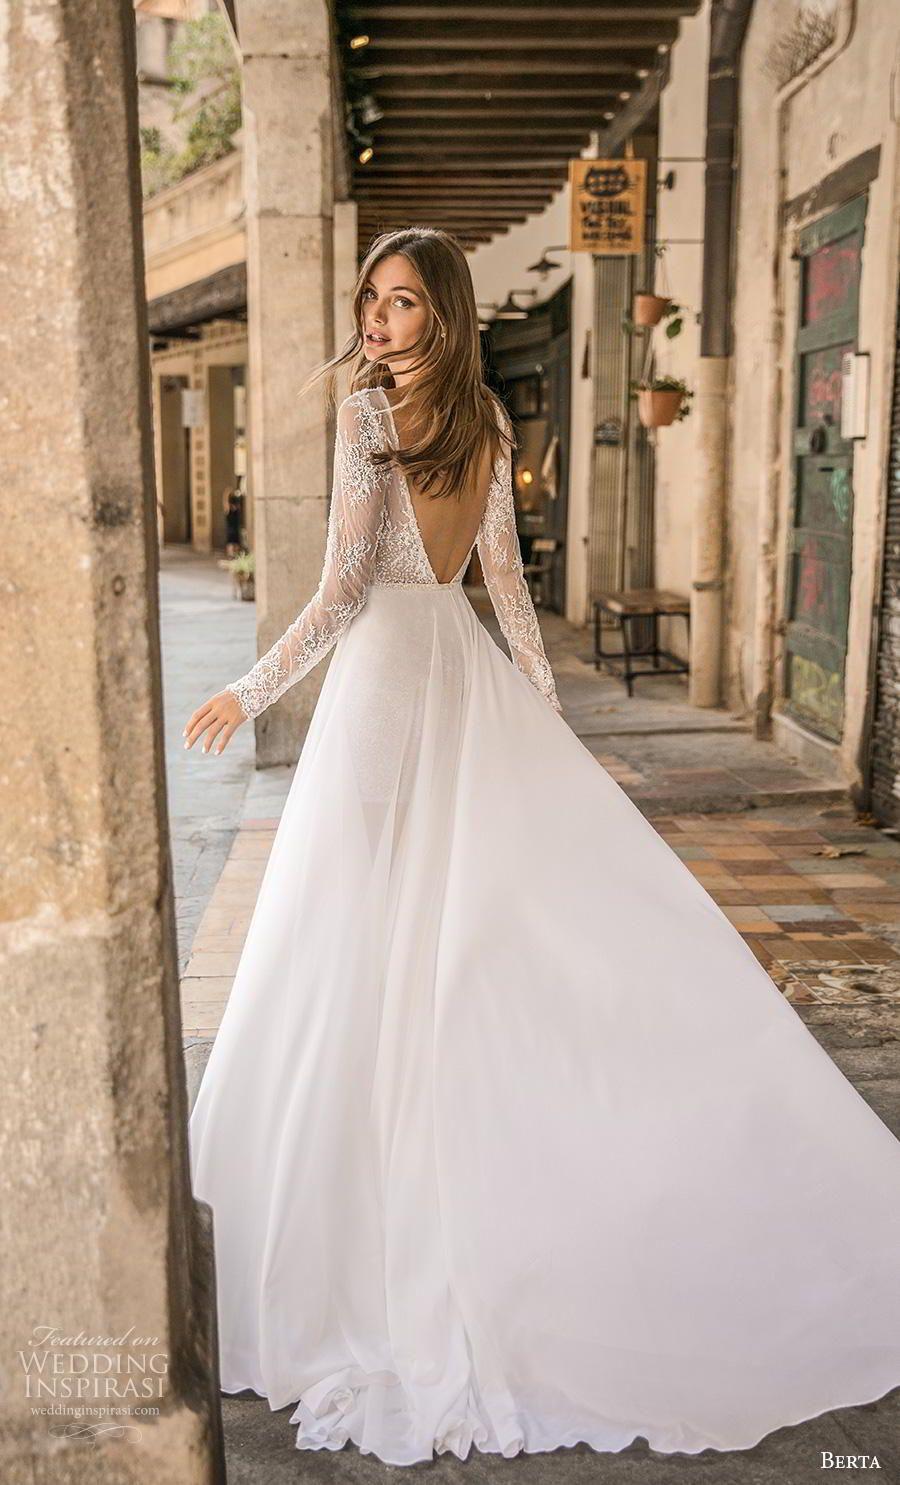 Muse by berta ucbarcelonaud wedding dresses in wedding